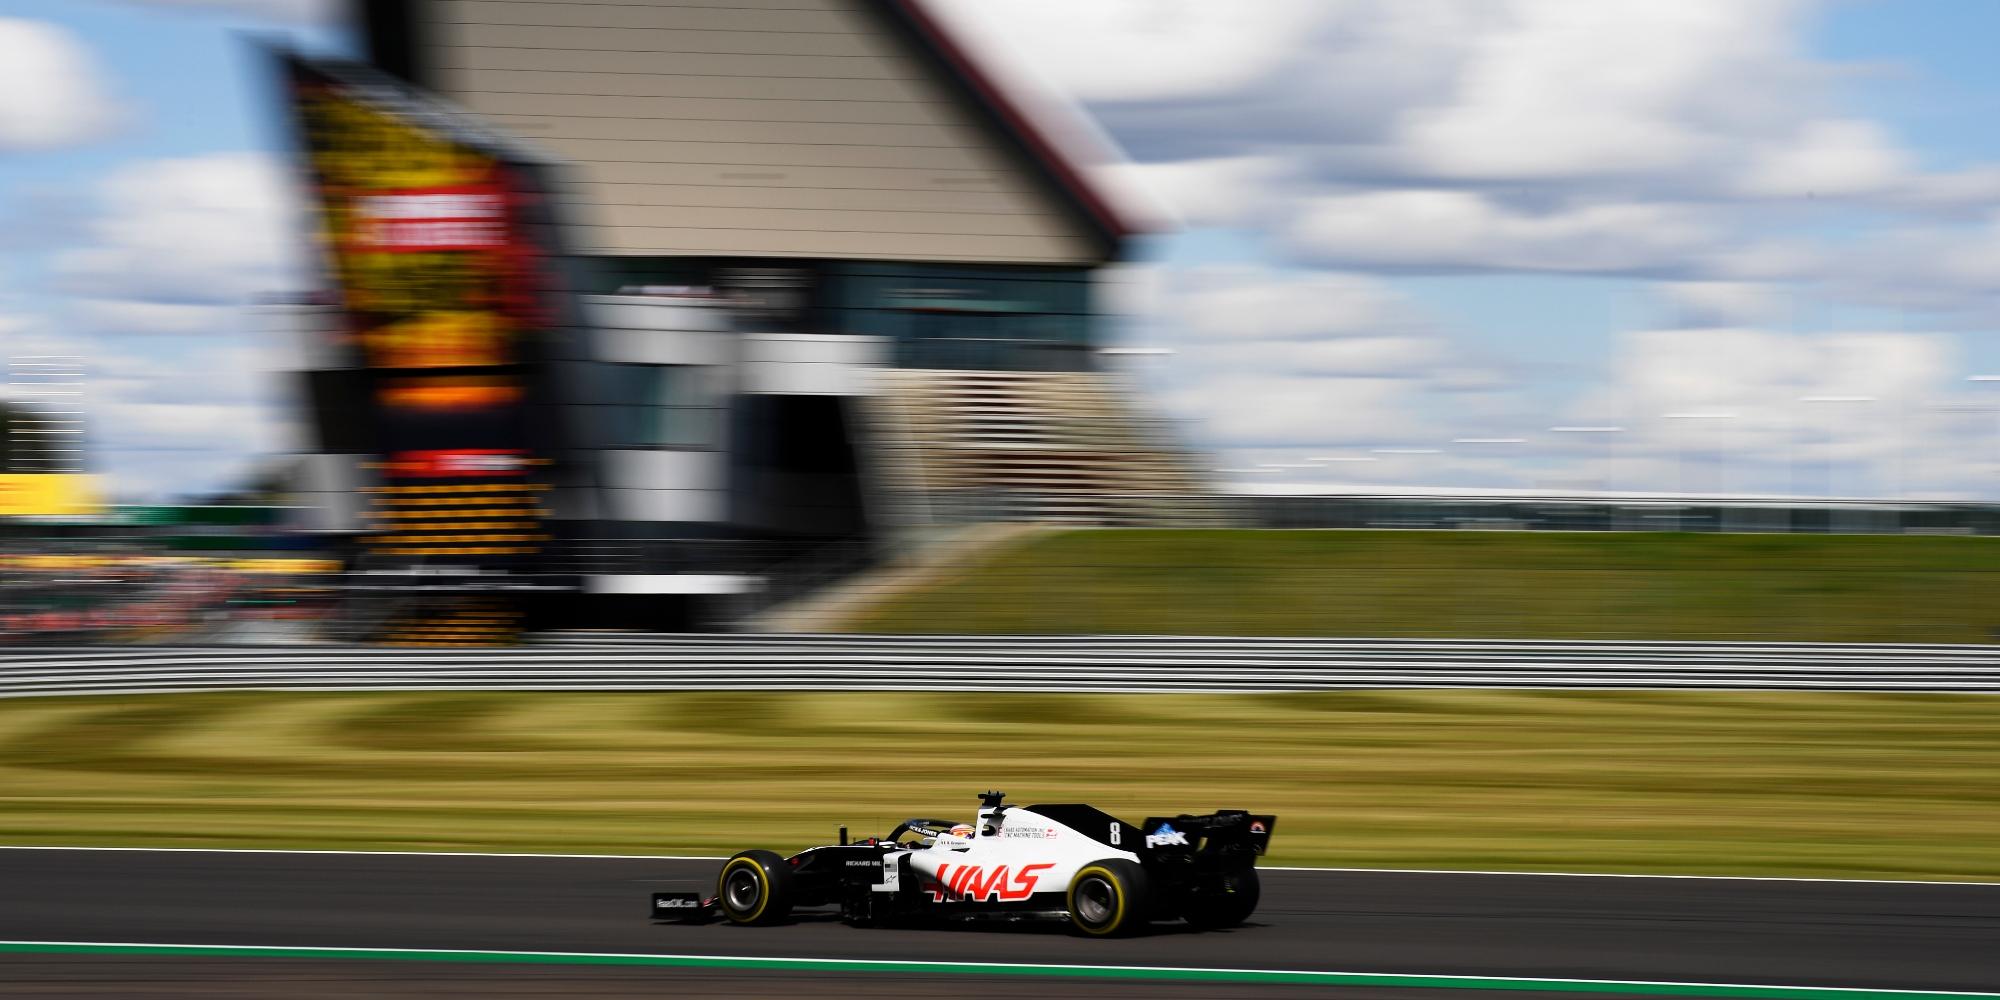 2020 British GP, Romain Grosjean